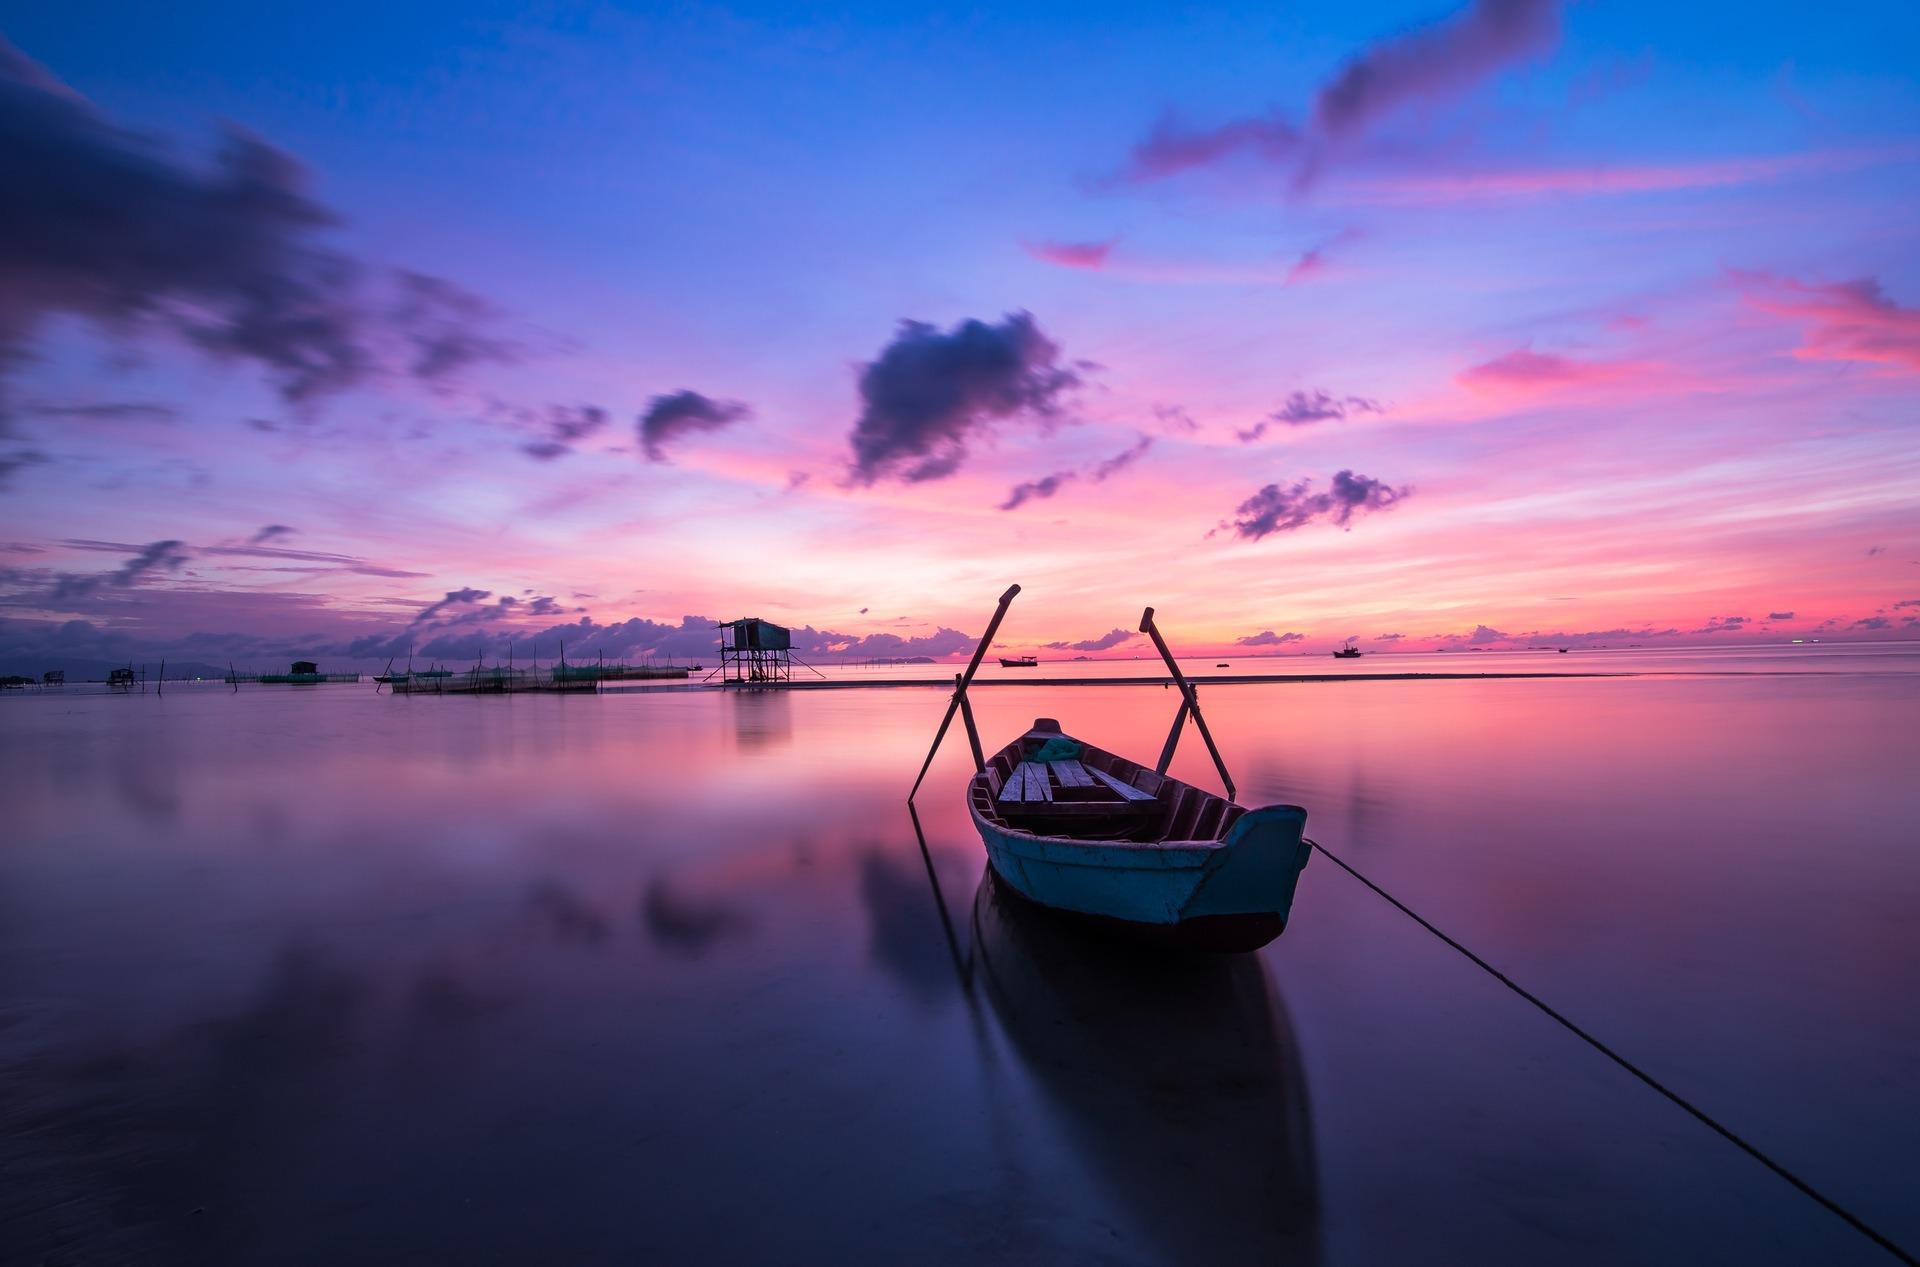 tramonto-phu-quoc-vietnam